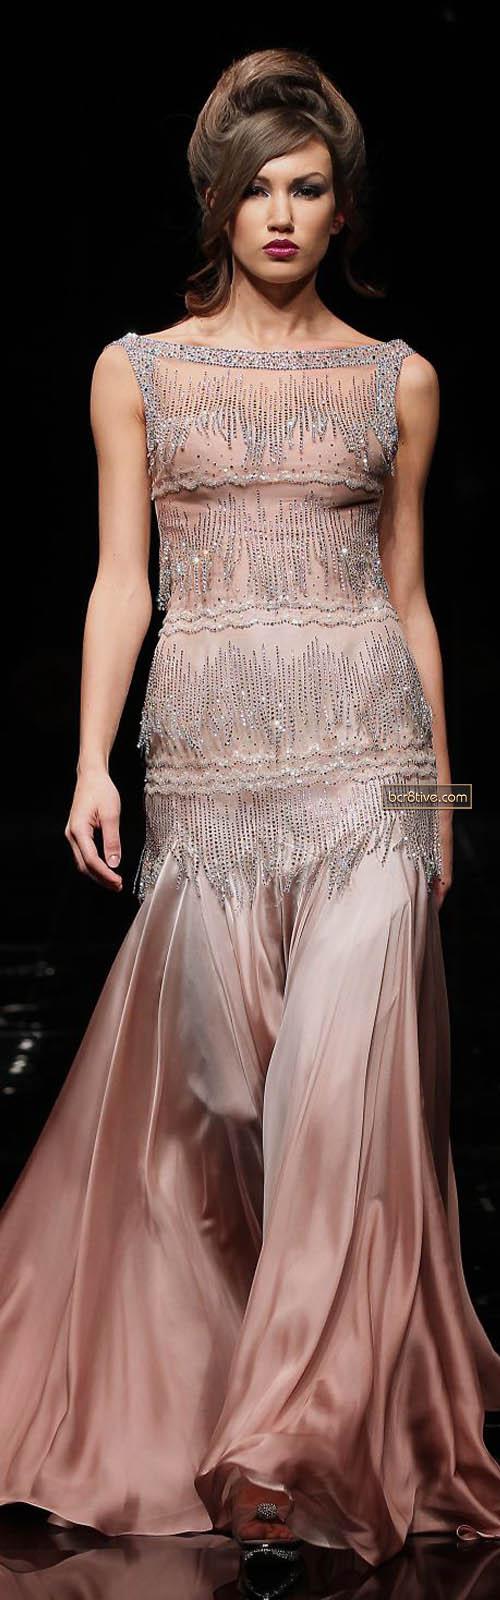 Hanna Touma Spring Summer 2012 Haute Couture